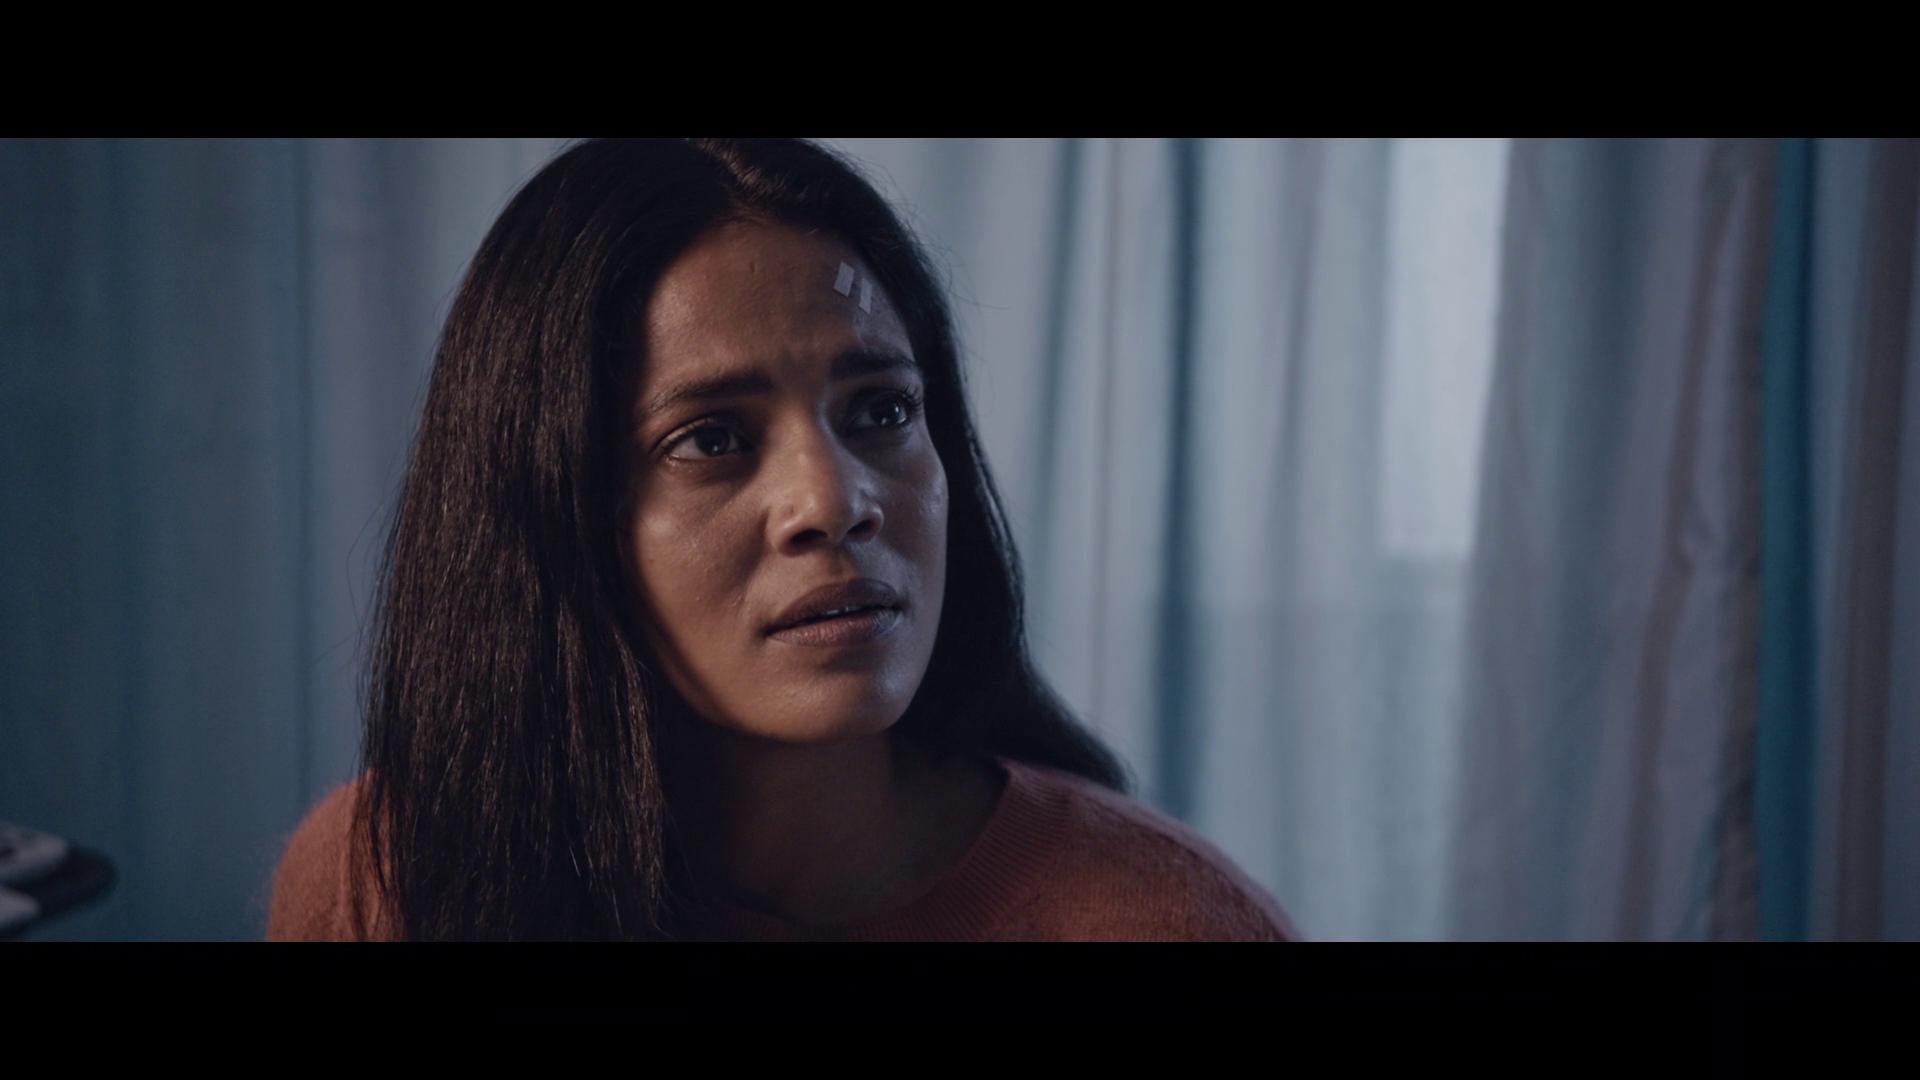 Mortal (2020) 1080p 60FPS BDrip Latino